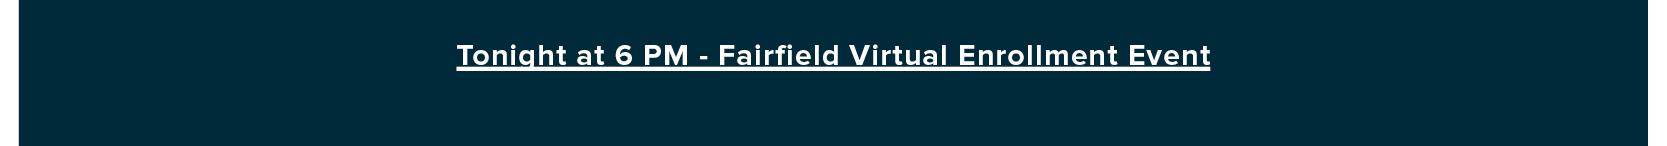 Tonight at 6 PM – Fairfield Virtual Enrollment Event